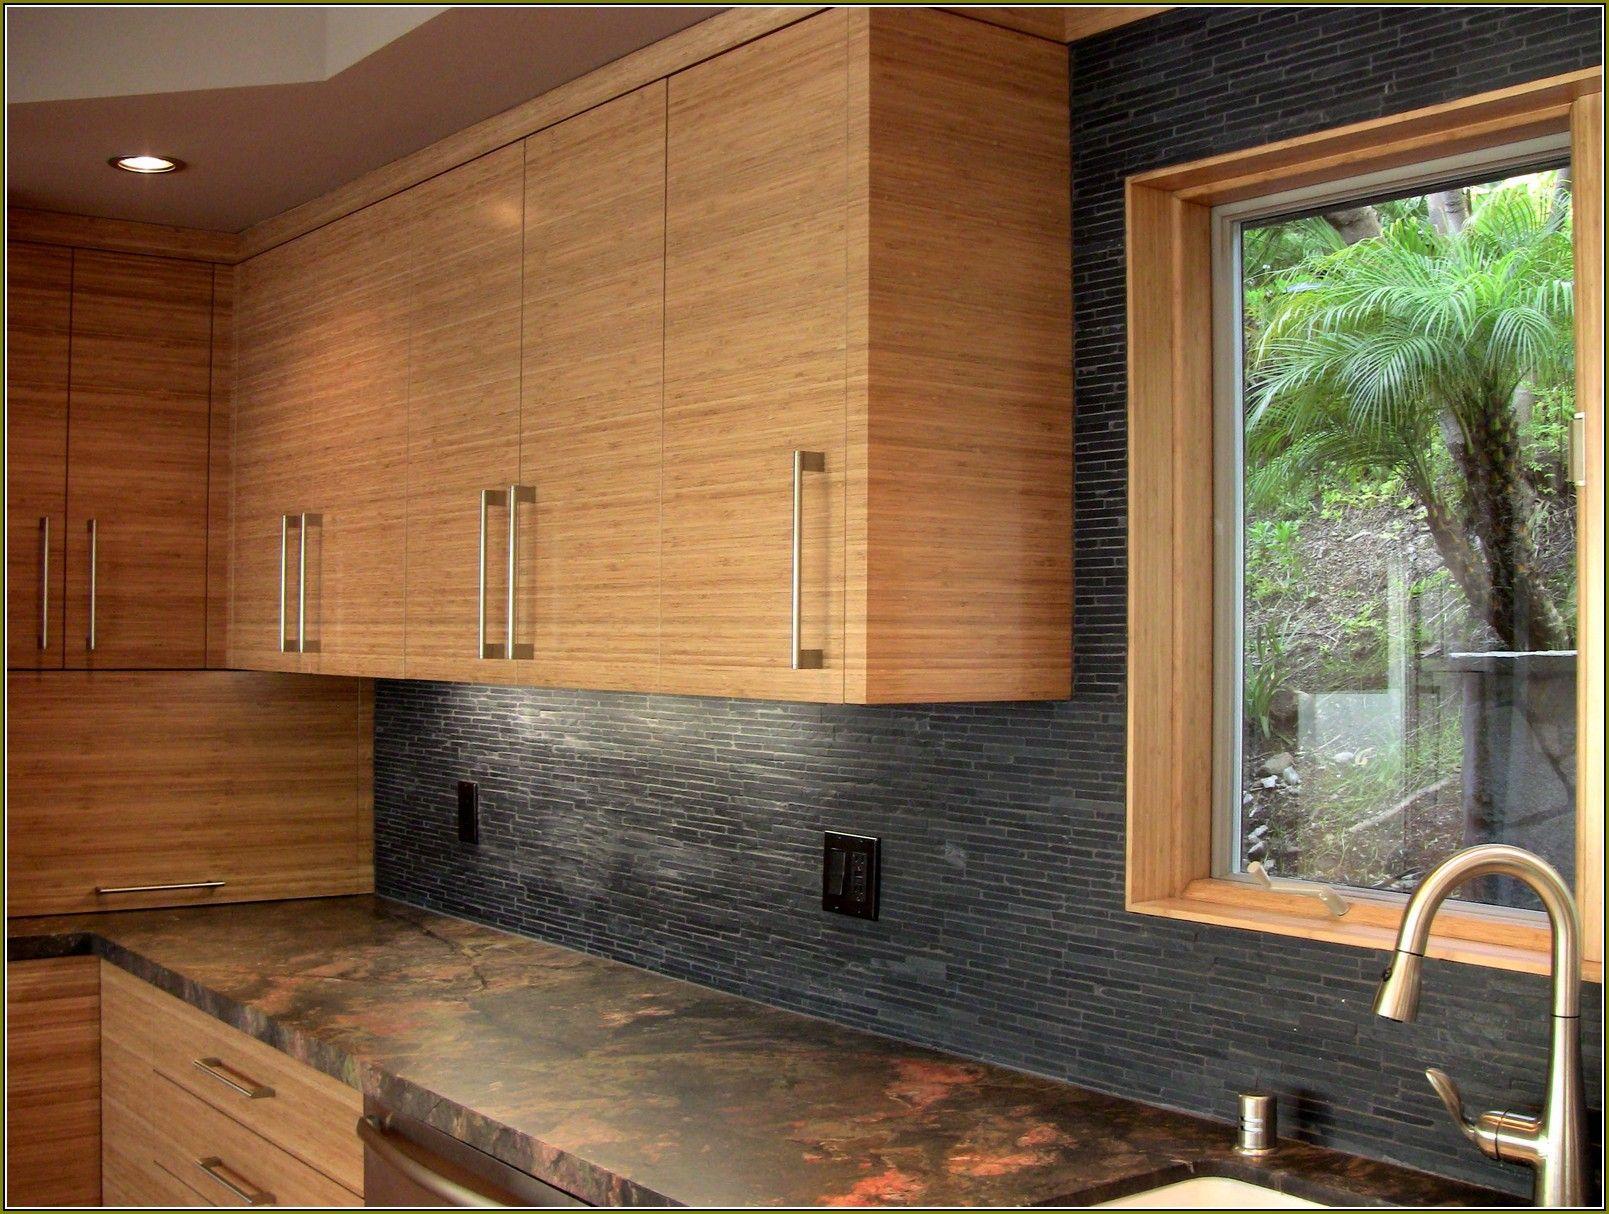 New Bamboo Kitchen Cabinets Russellvillefbc Ideas Perfect Bamboo Kitchen Cabinets In 2020 Bamboo Kitchen Cabinets Kitchen Cabinet Styles Bamboo Cabinets